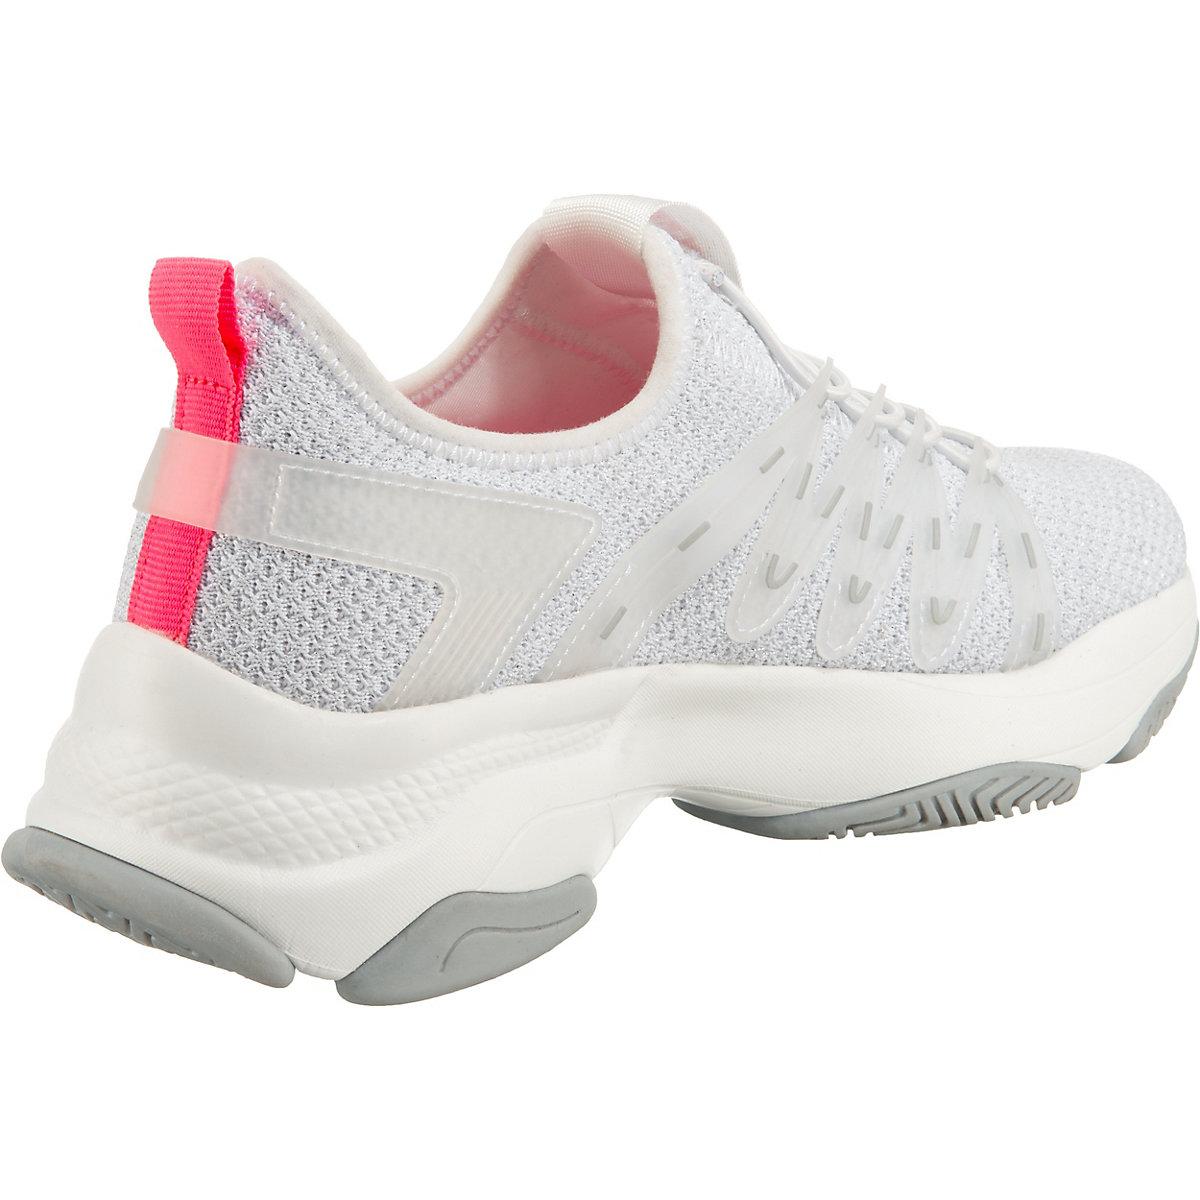 Dockers By Gerli, 700' Sneakers Low, Weiß